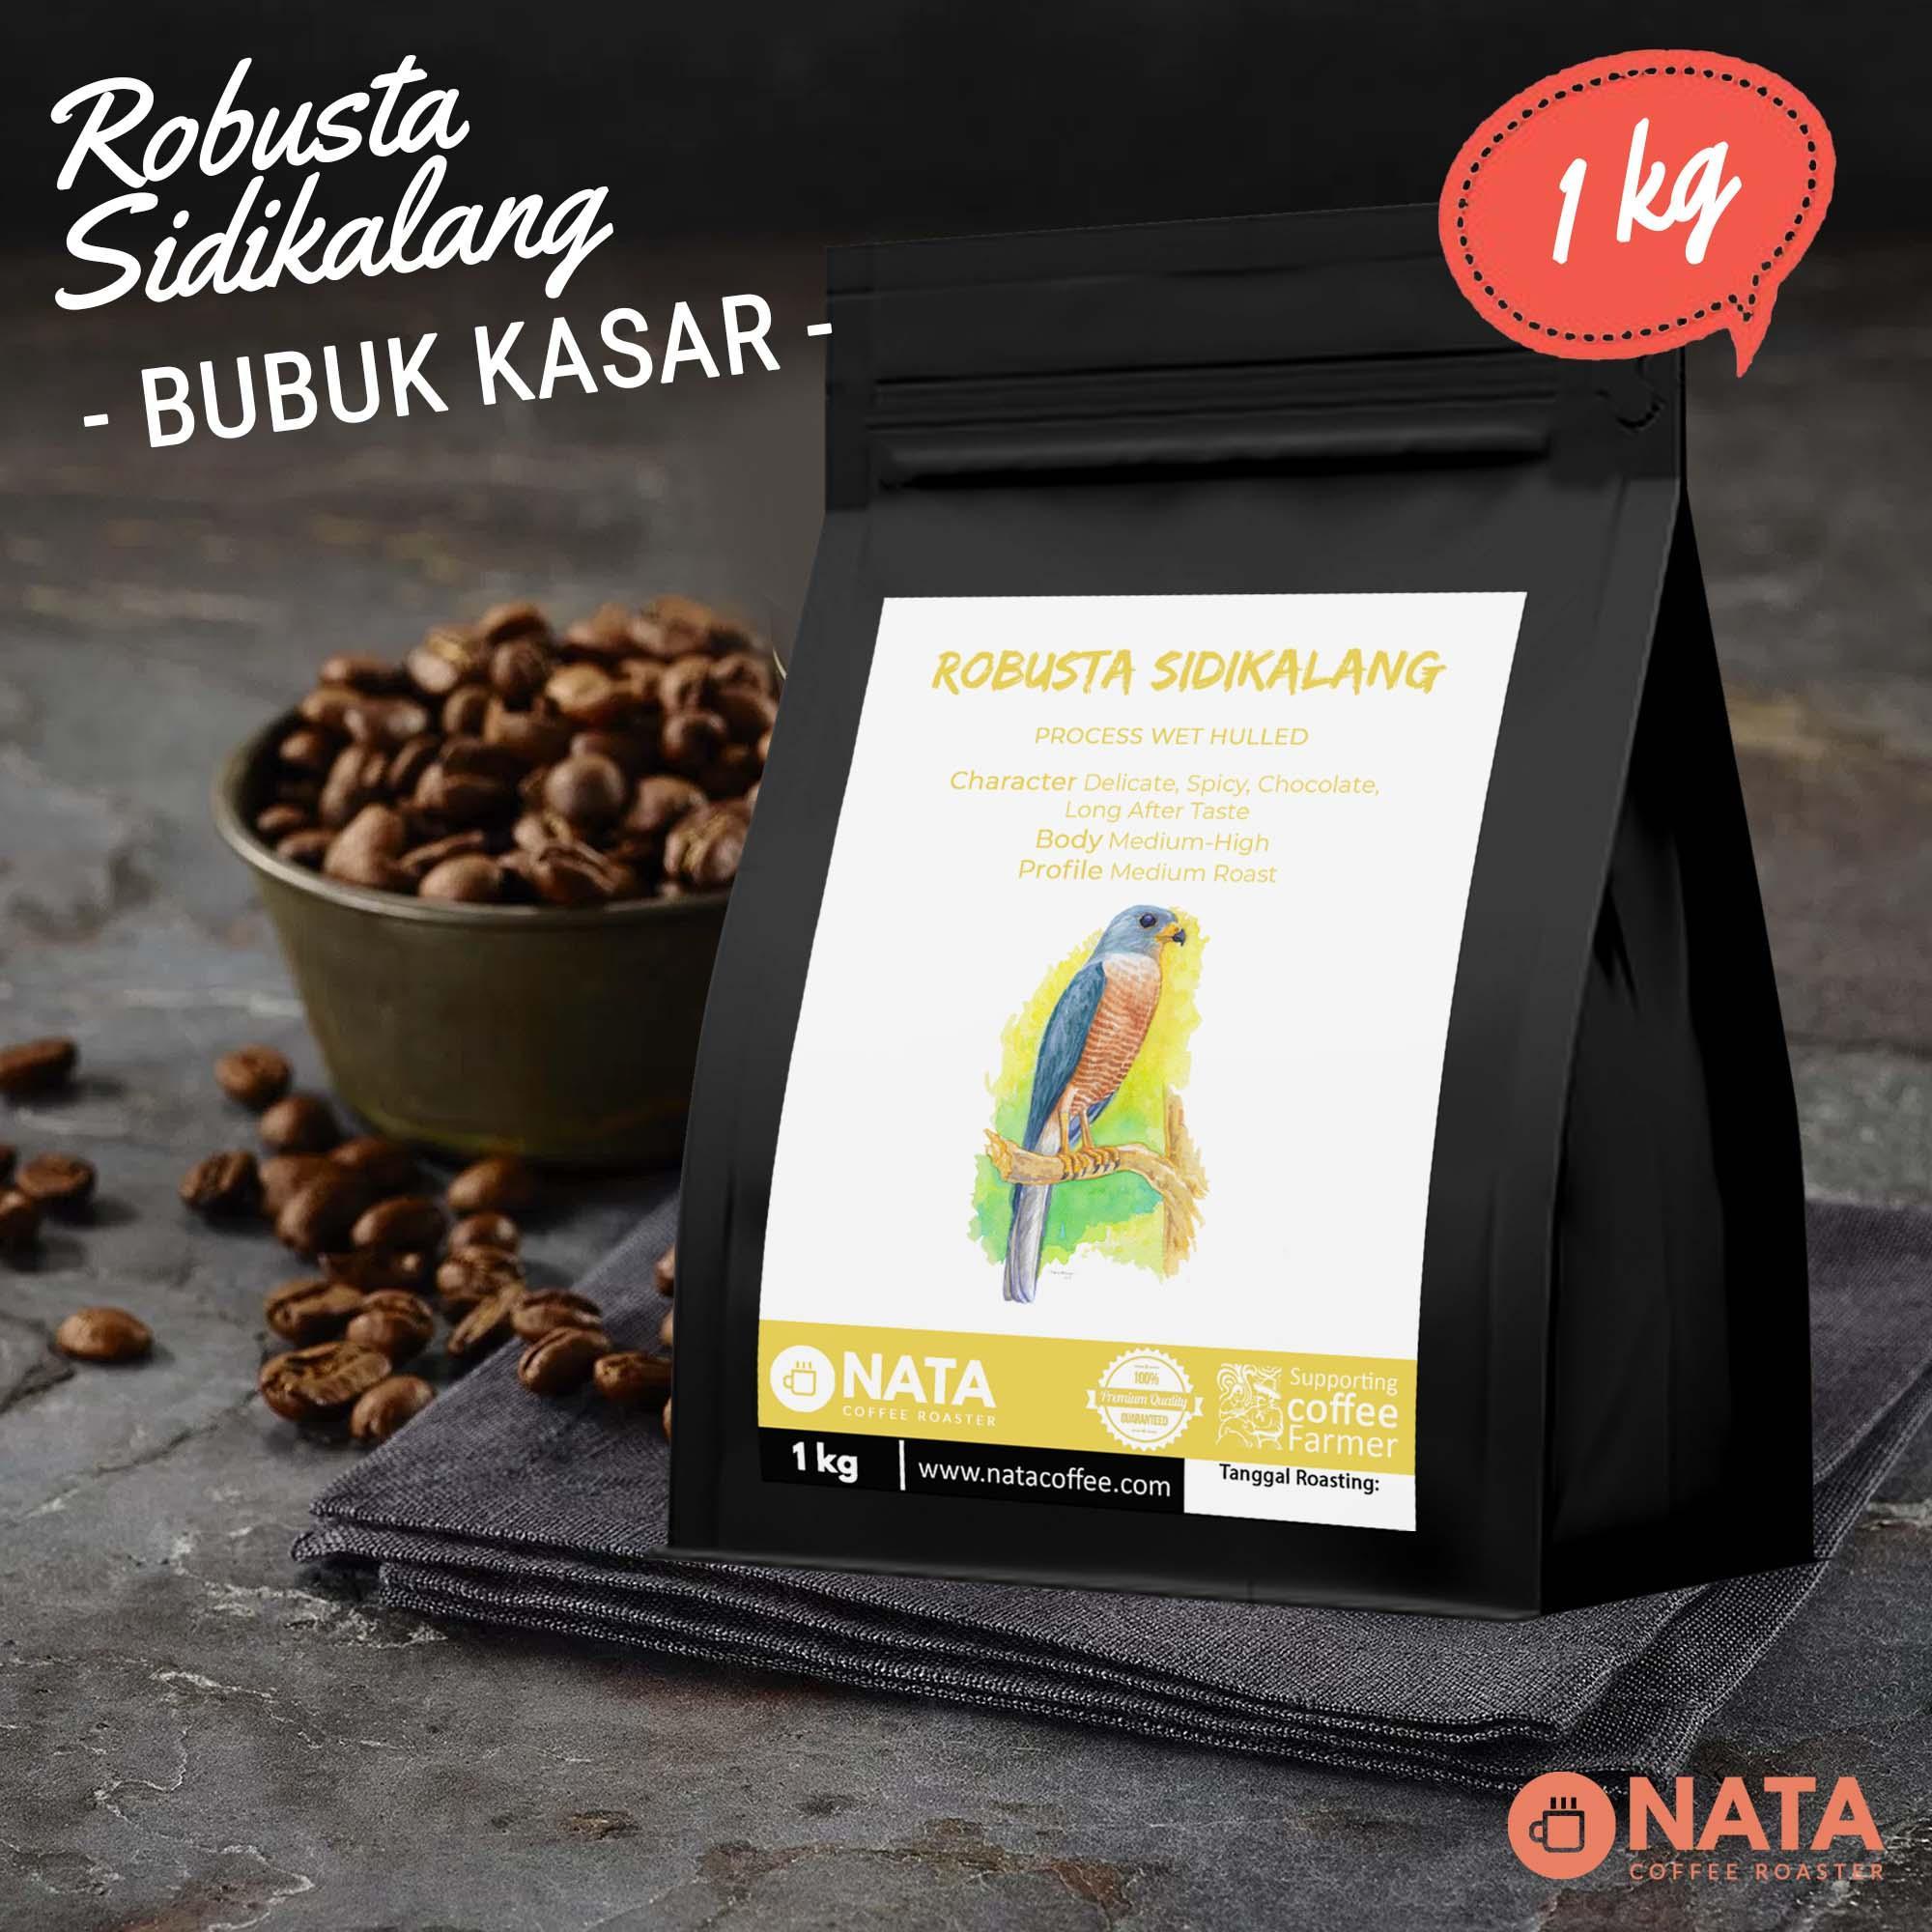 Kopi Tungku Mas Bubuk Kasar Daftar Harga Terkini Dan Terlengkap Biji Betina Warung Tinggi Premium Blended Coffee 250 Gram Nata Sidikalang Robusta 1kg